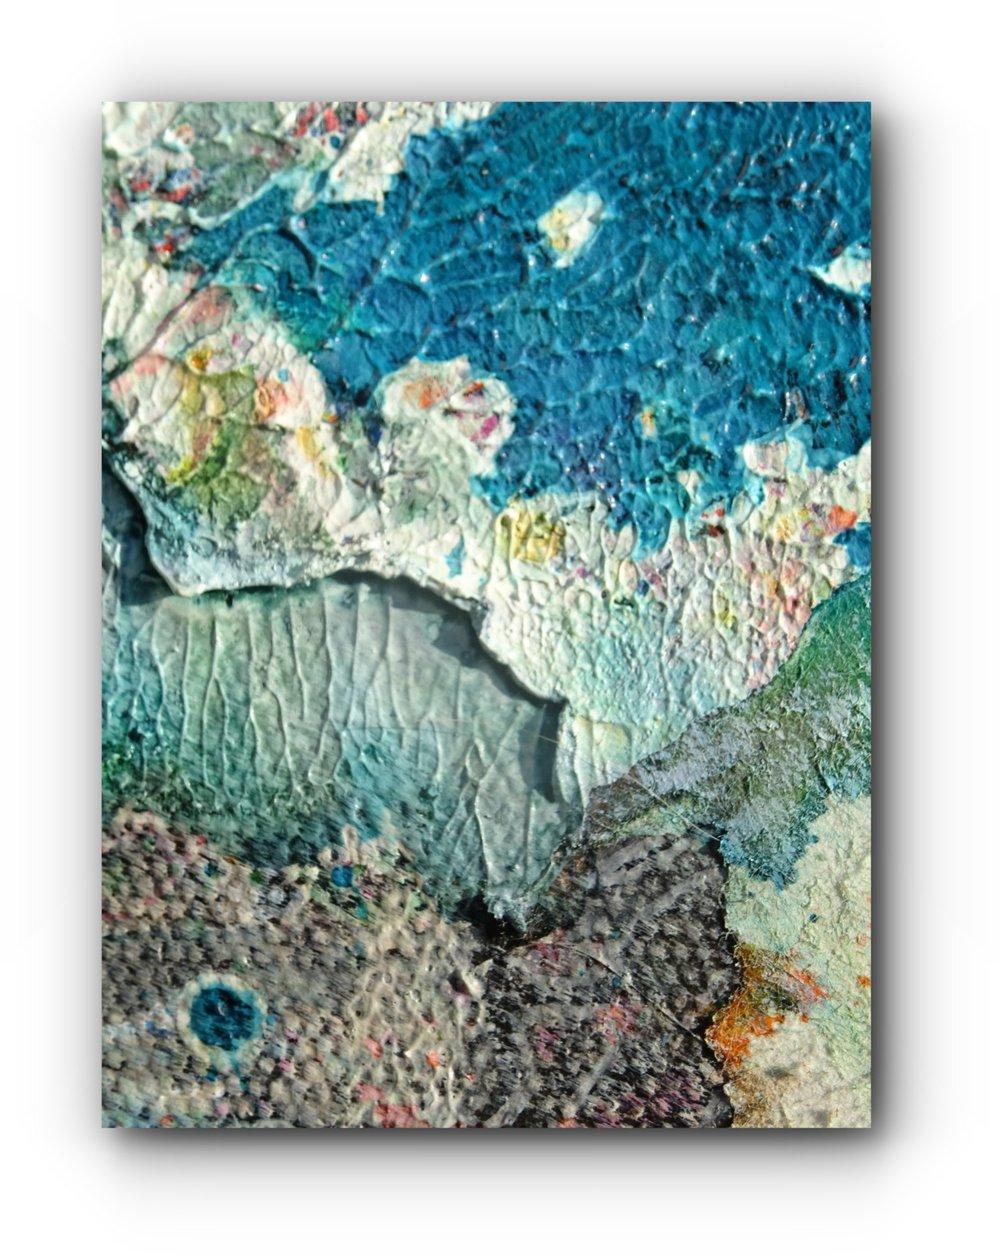 painting-detail-16-birds-eye-view-ingress-vortices.jpg